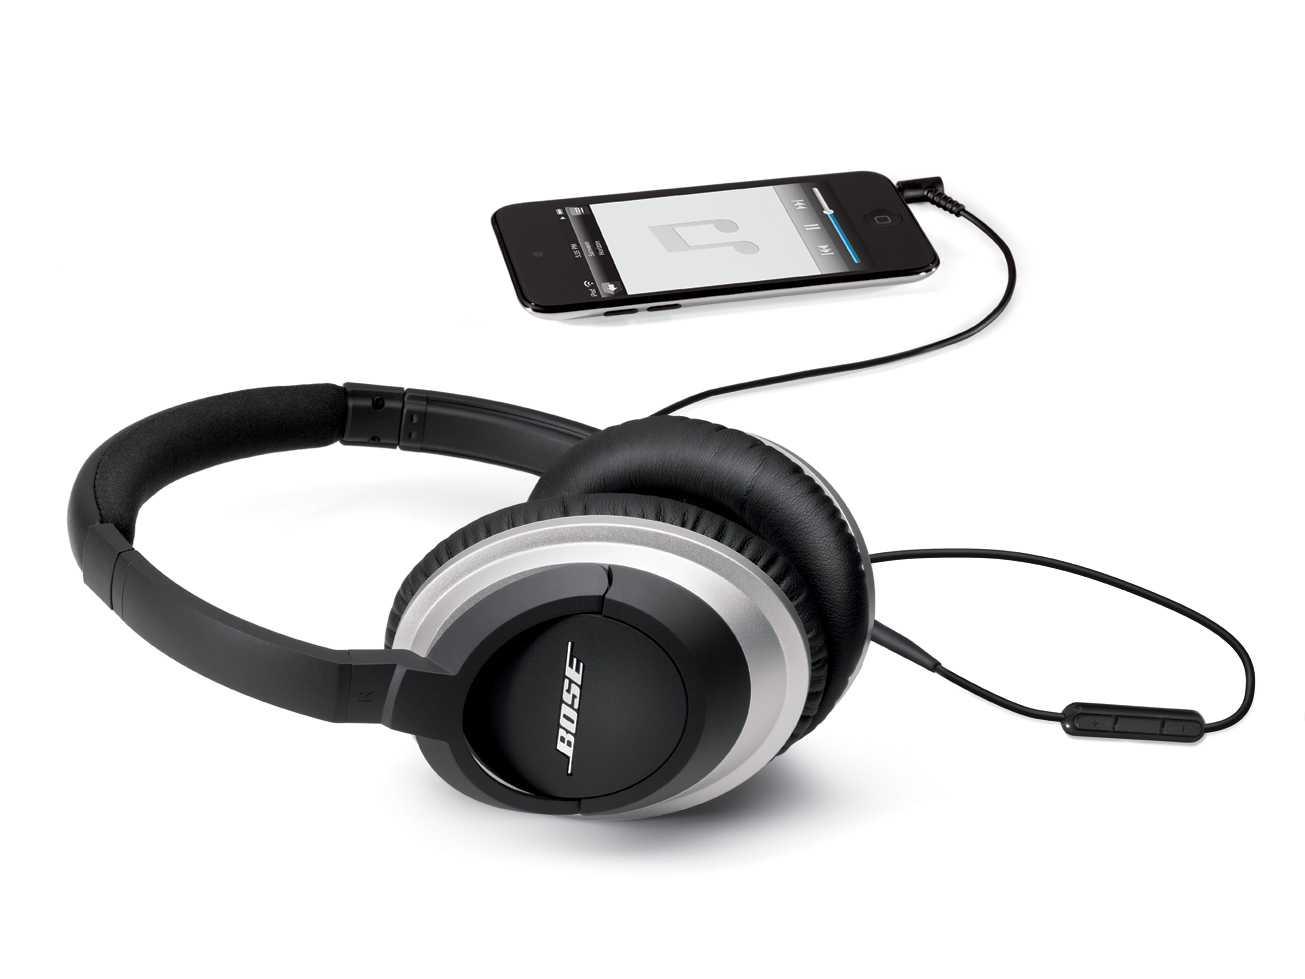 Bose_ae2i_headphones_014_HR-1mn0